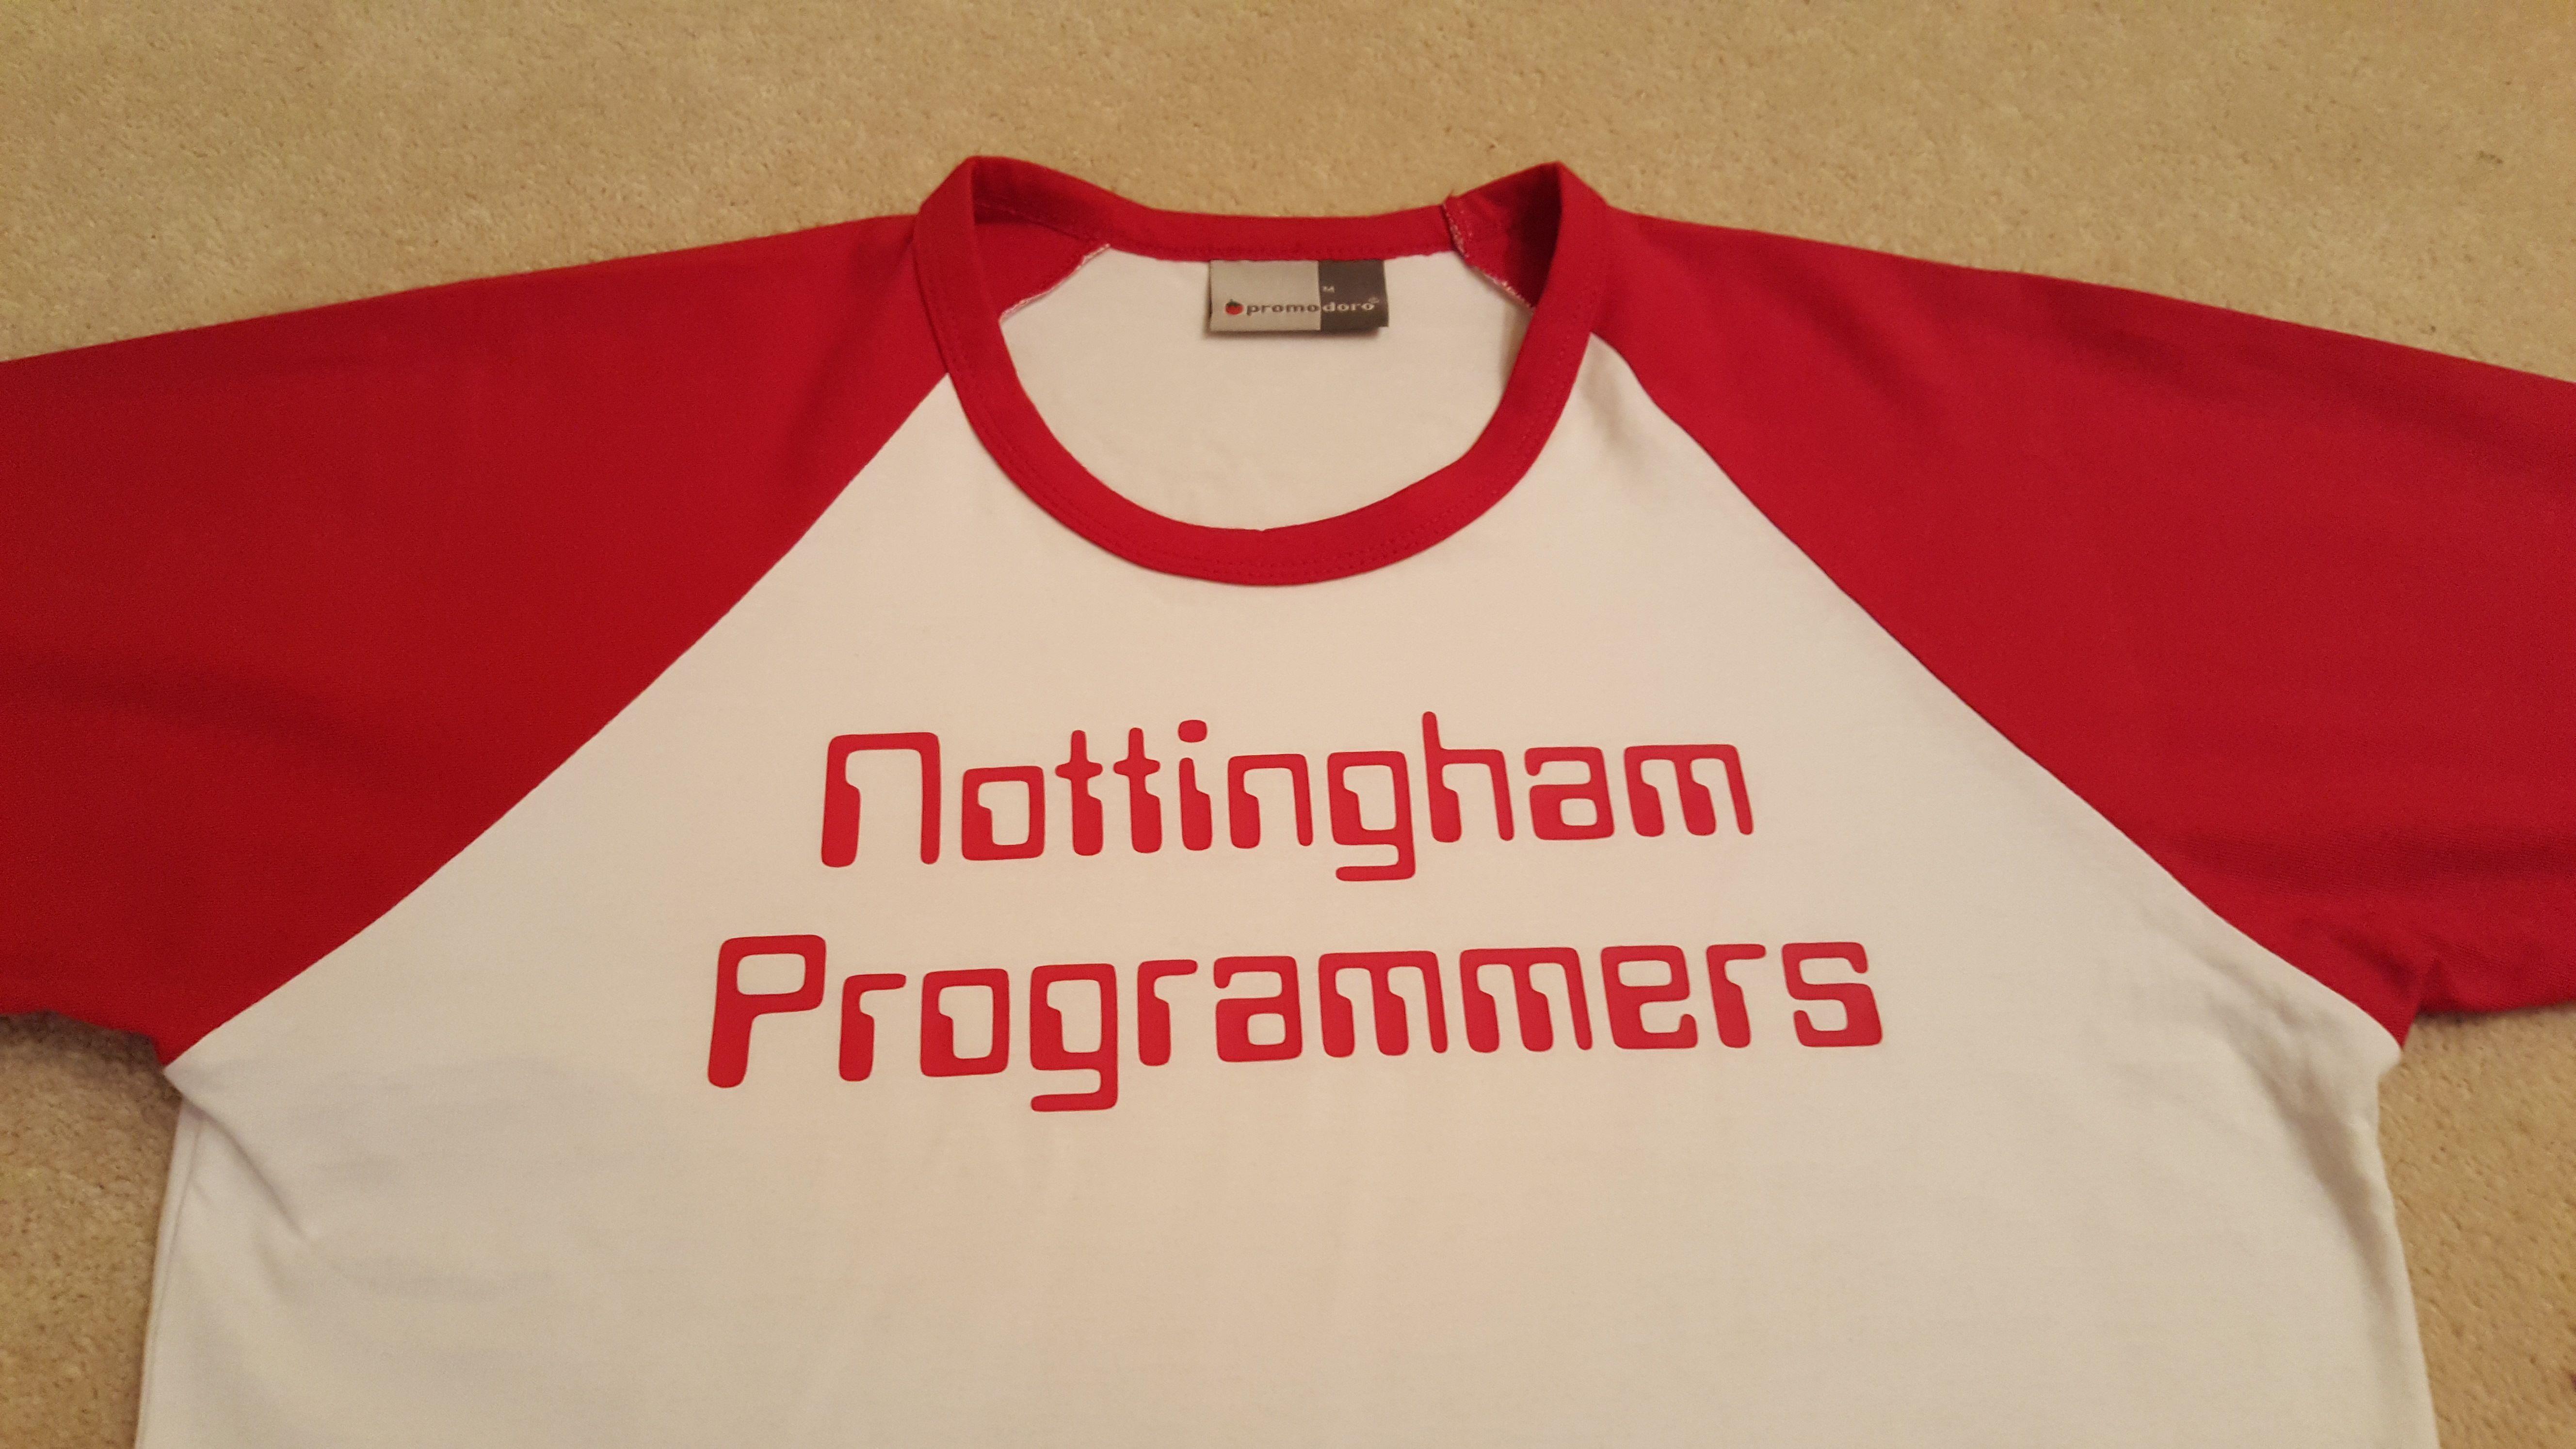 Nottingham Programmers Meetup Group